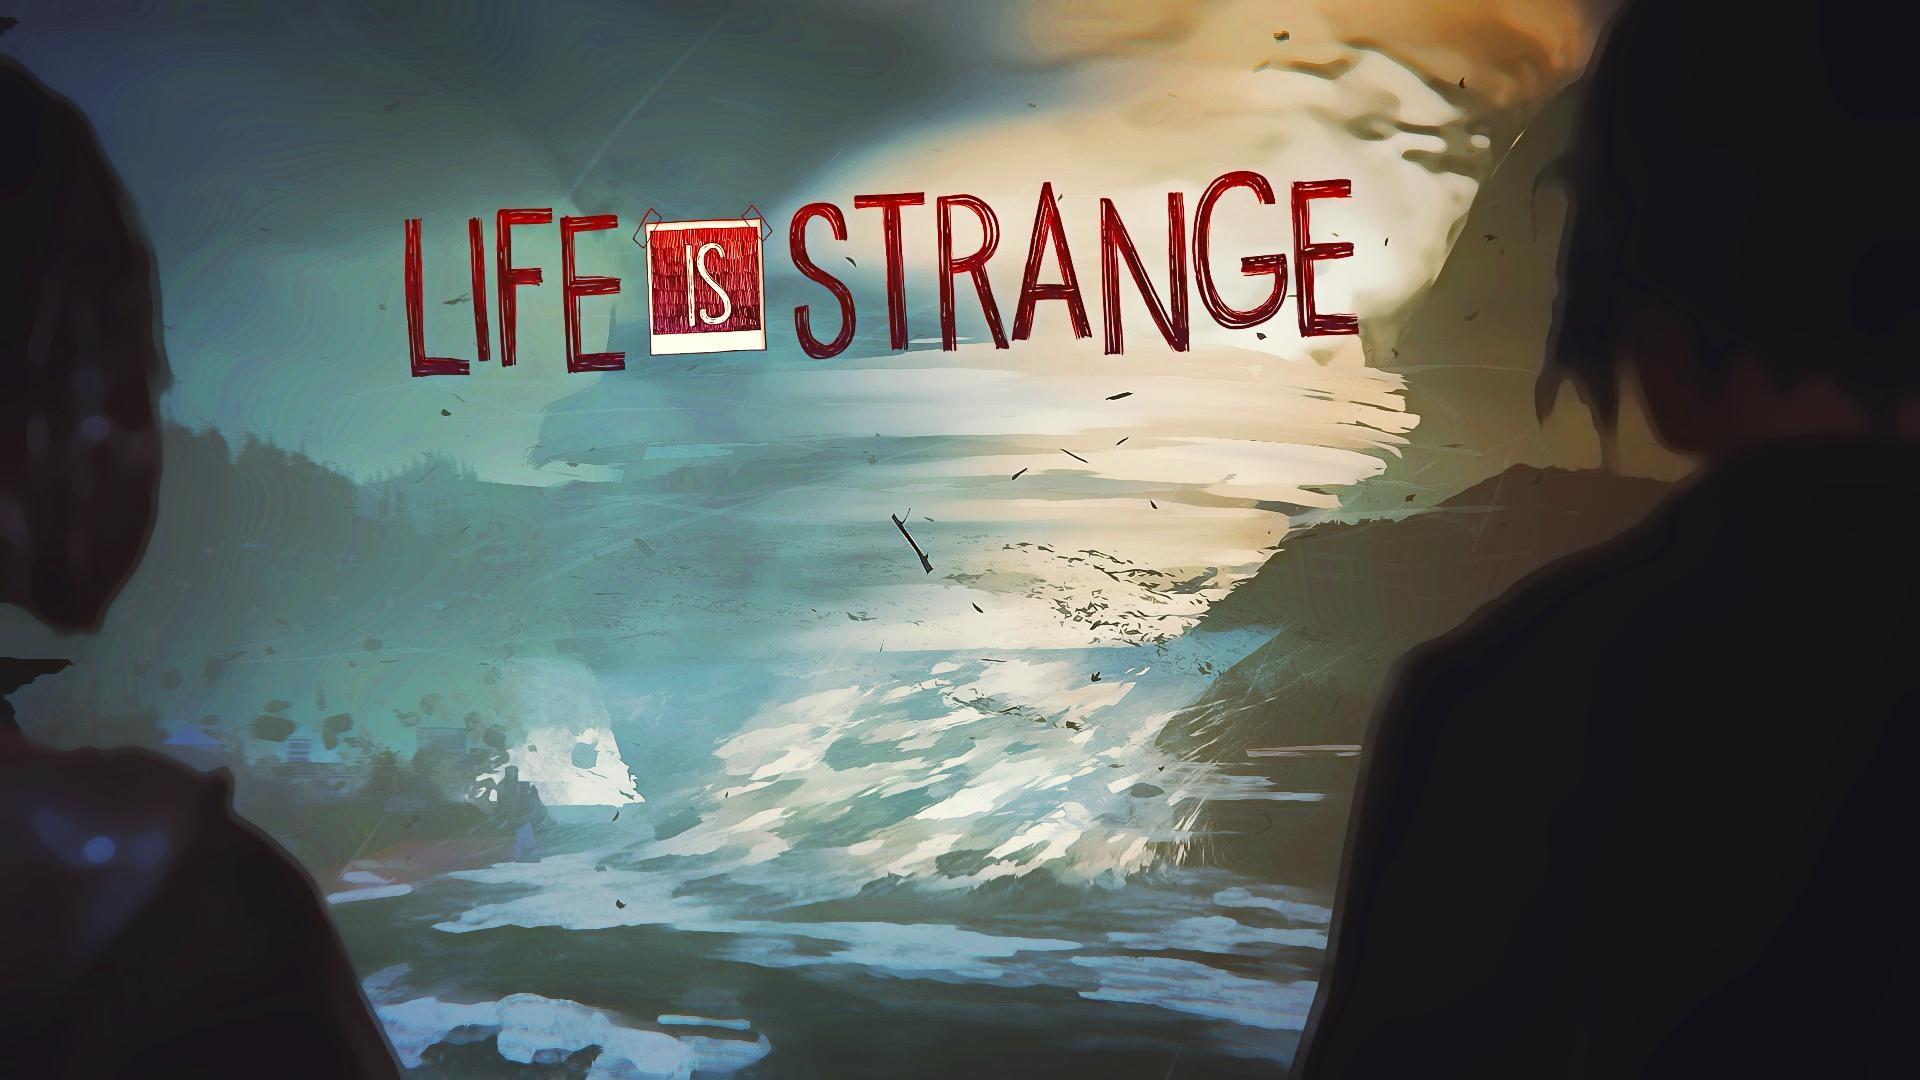 [EP5 SPOILERS] [Wallpaper] Life Is Strange EP5 WallpaperScreenshot …